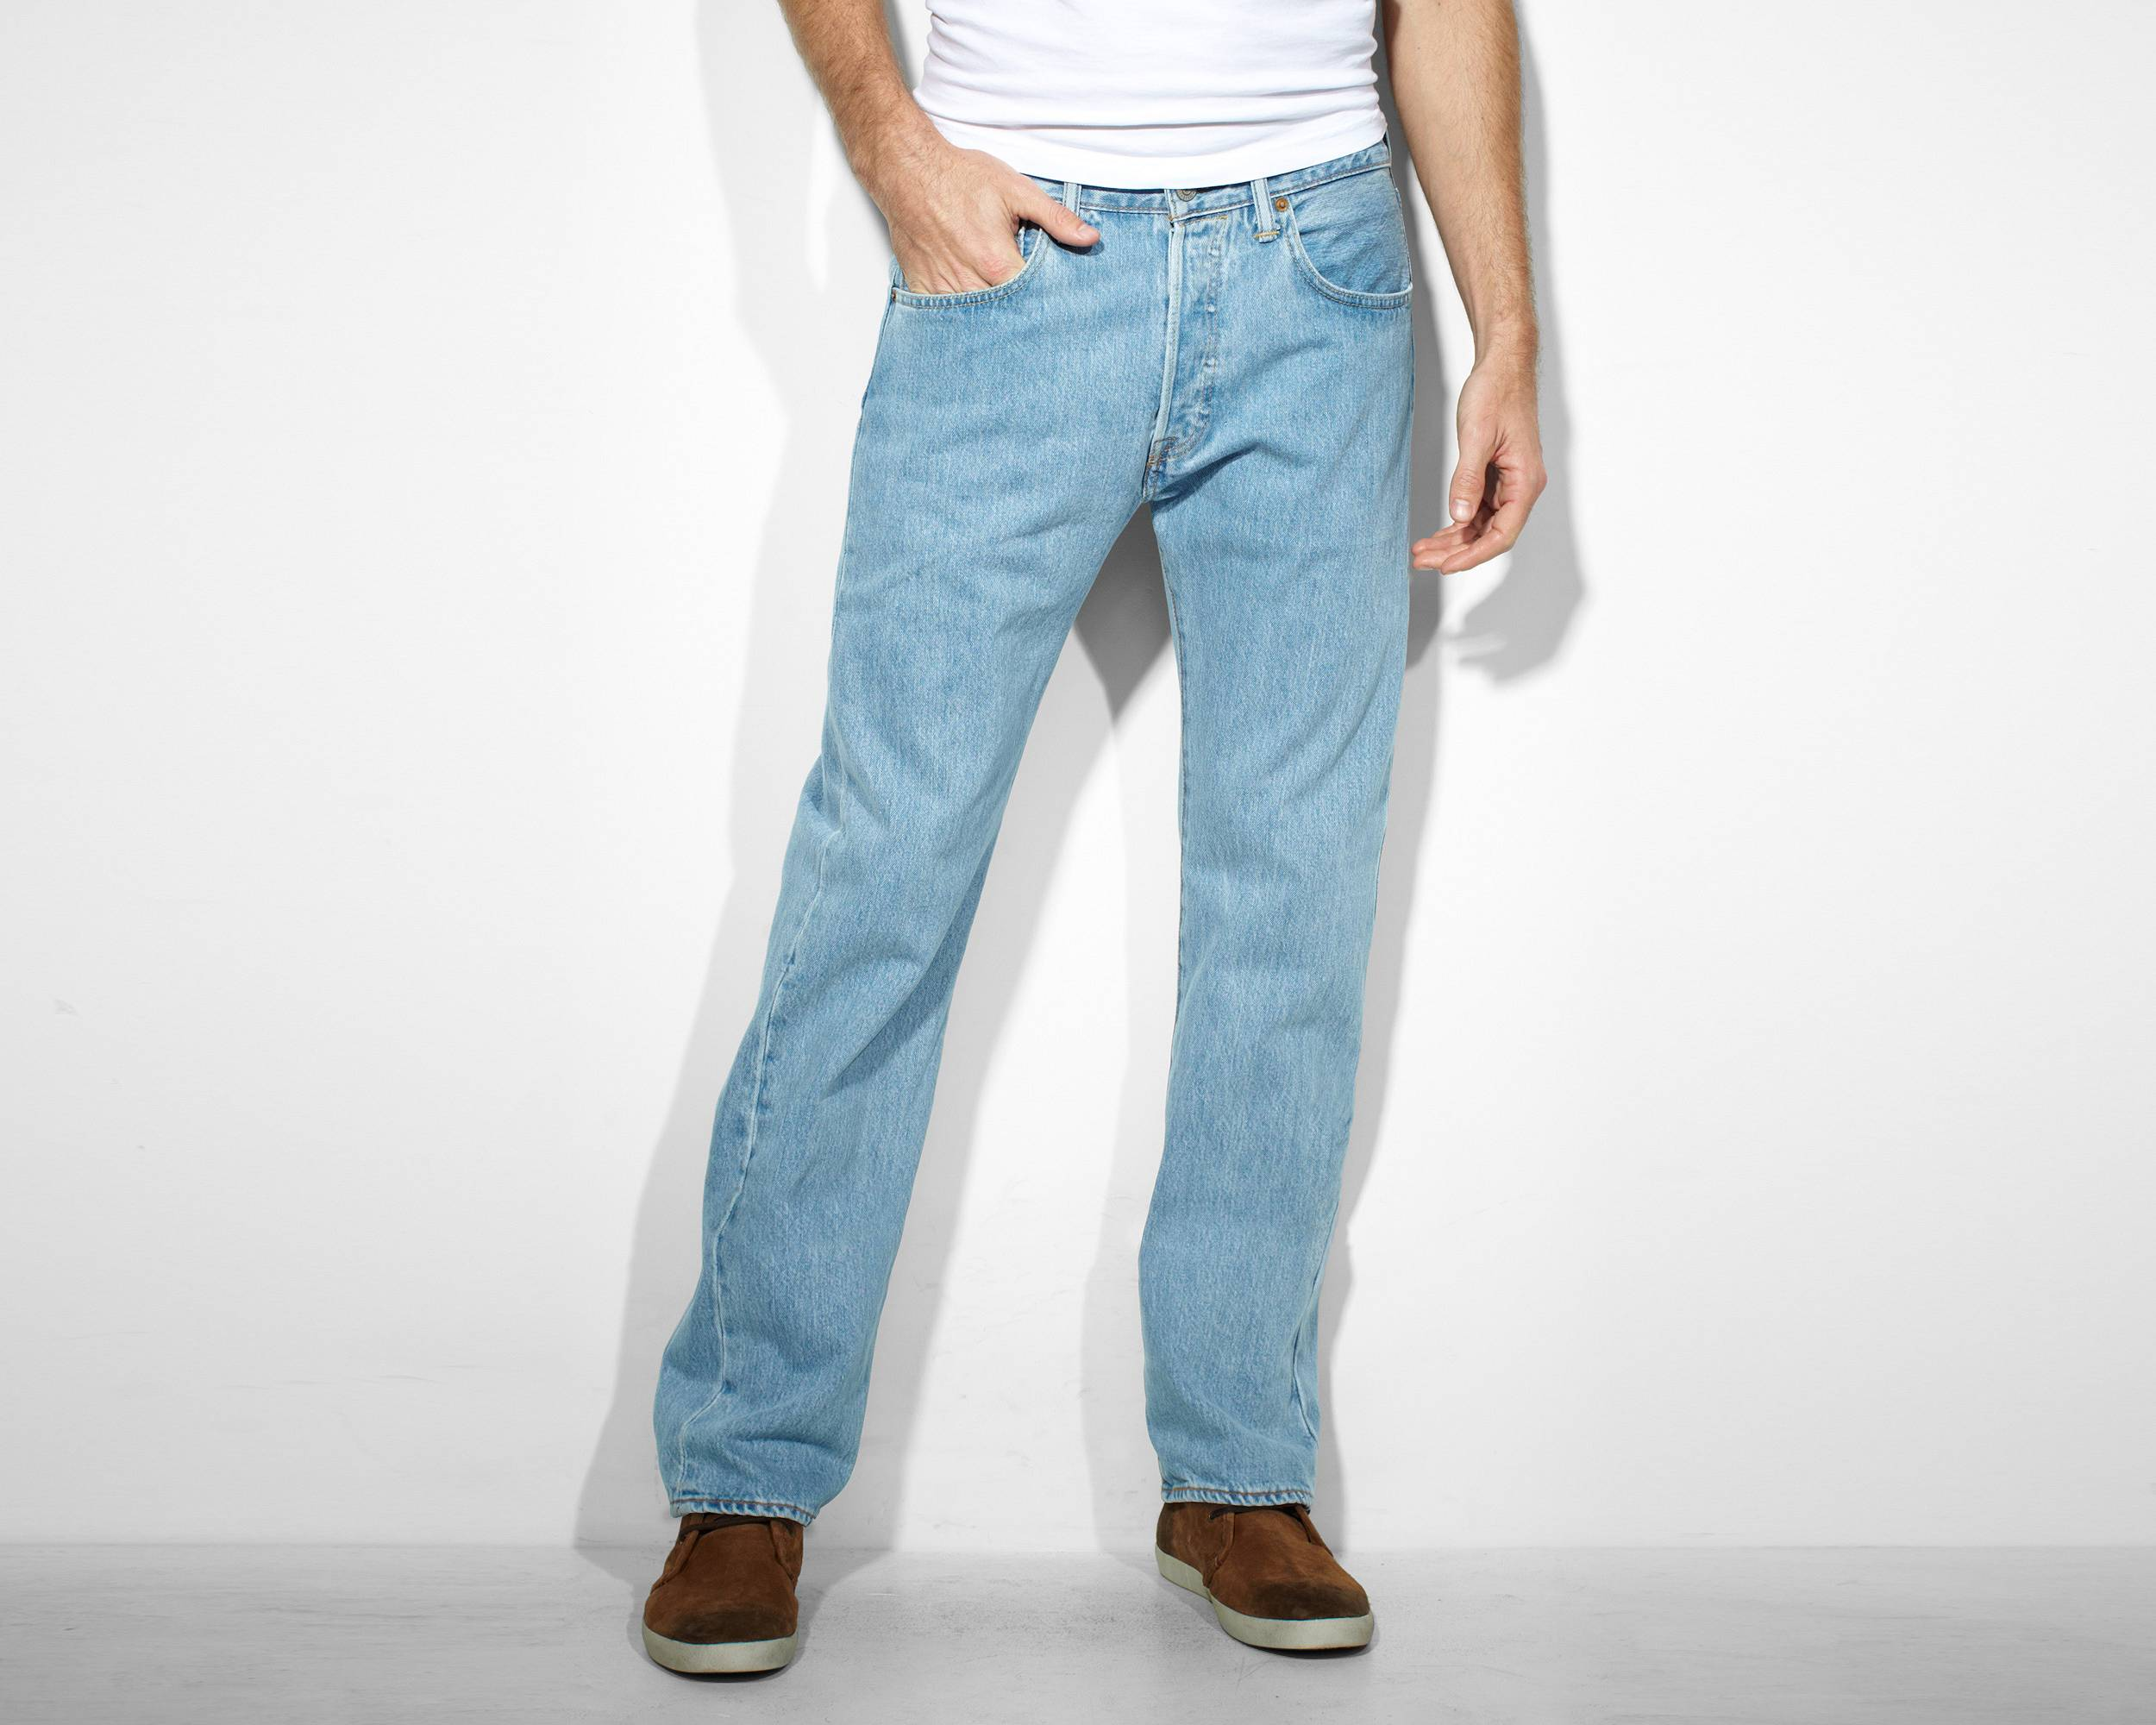 Mens Jeans 42 X 34